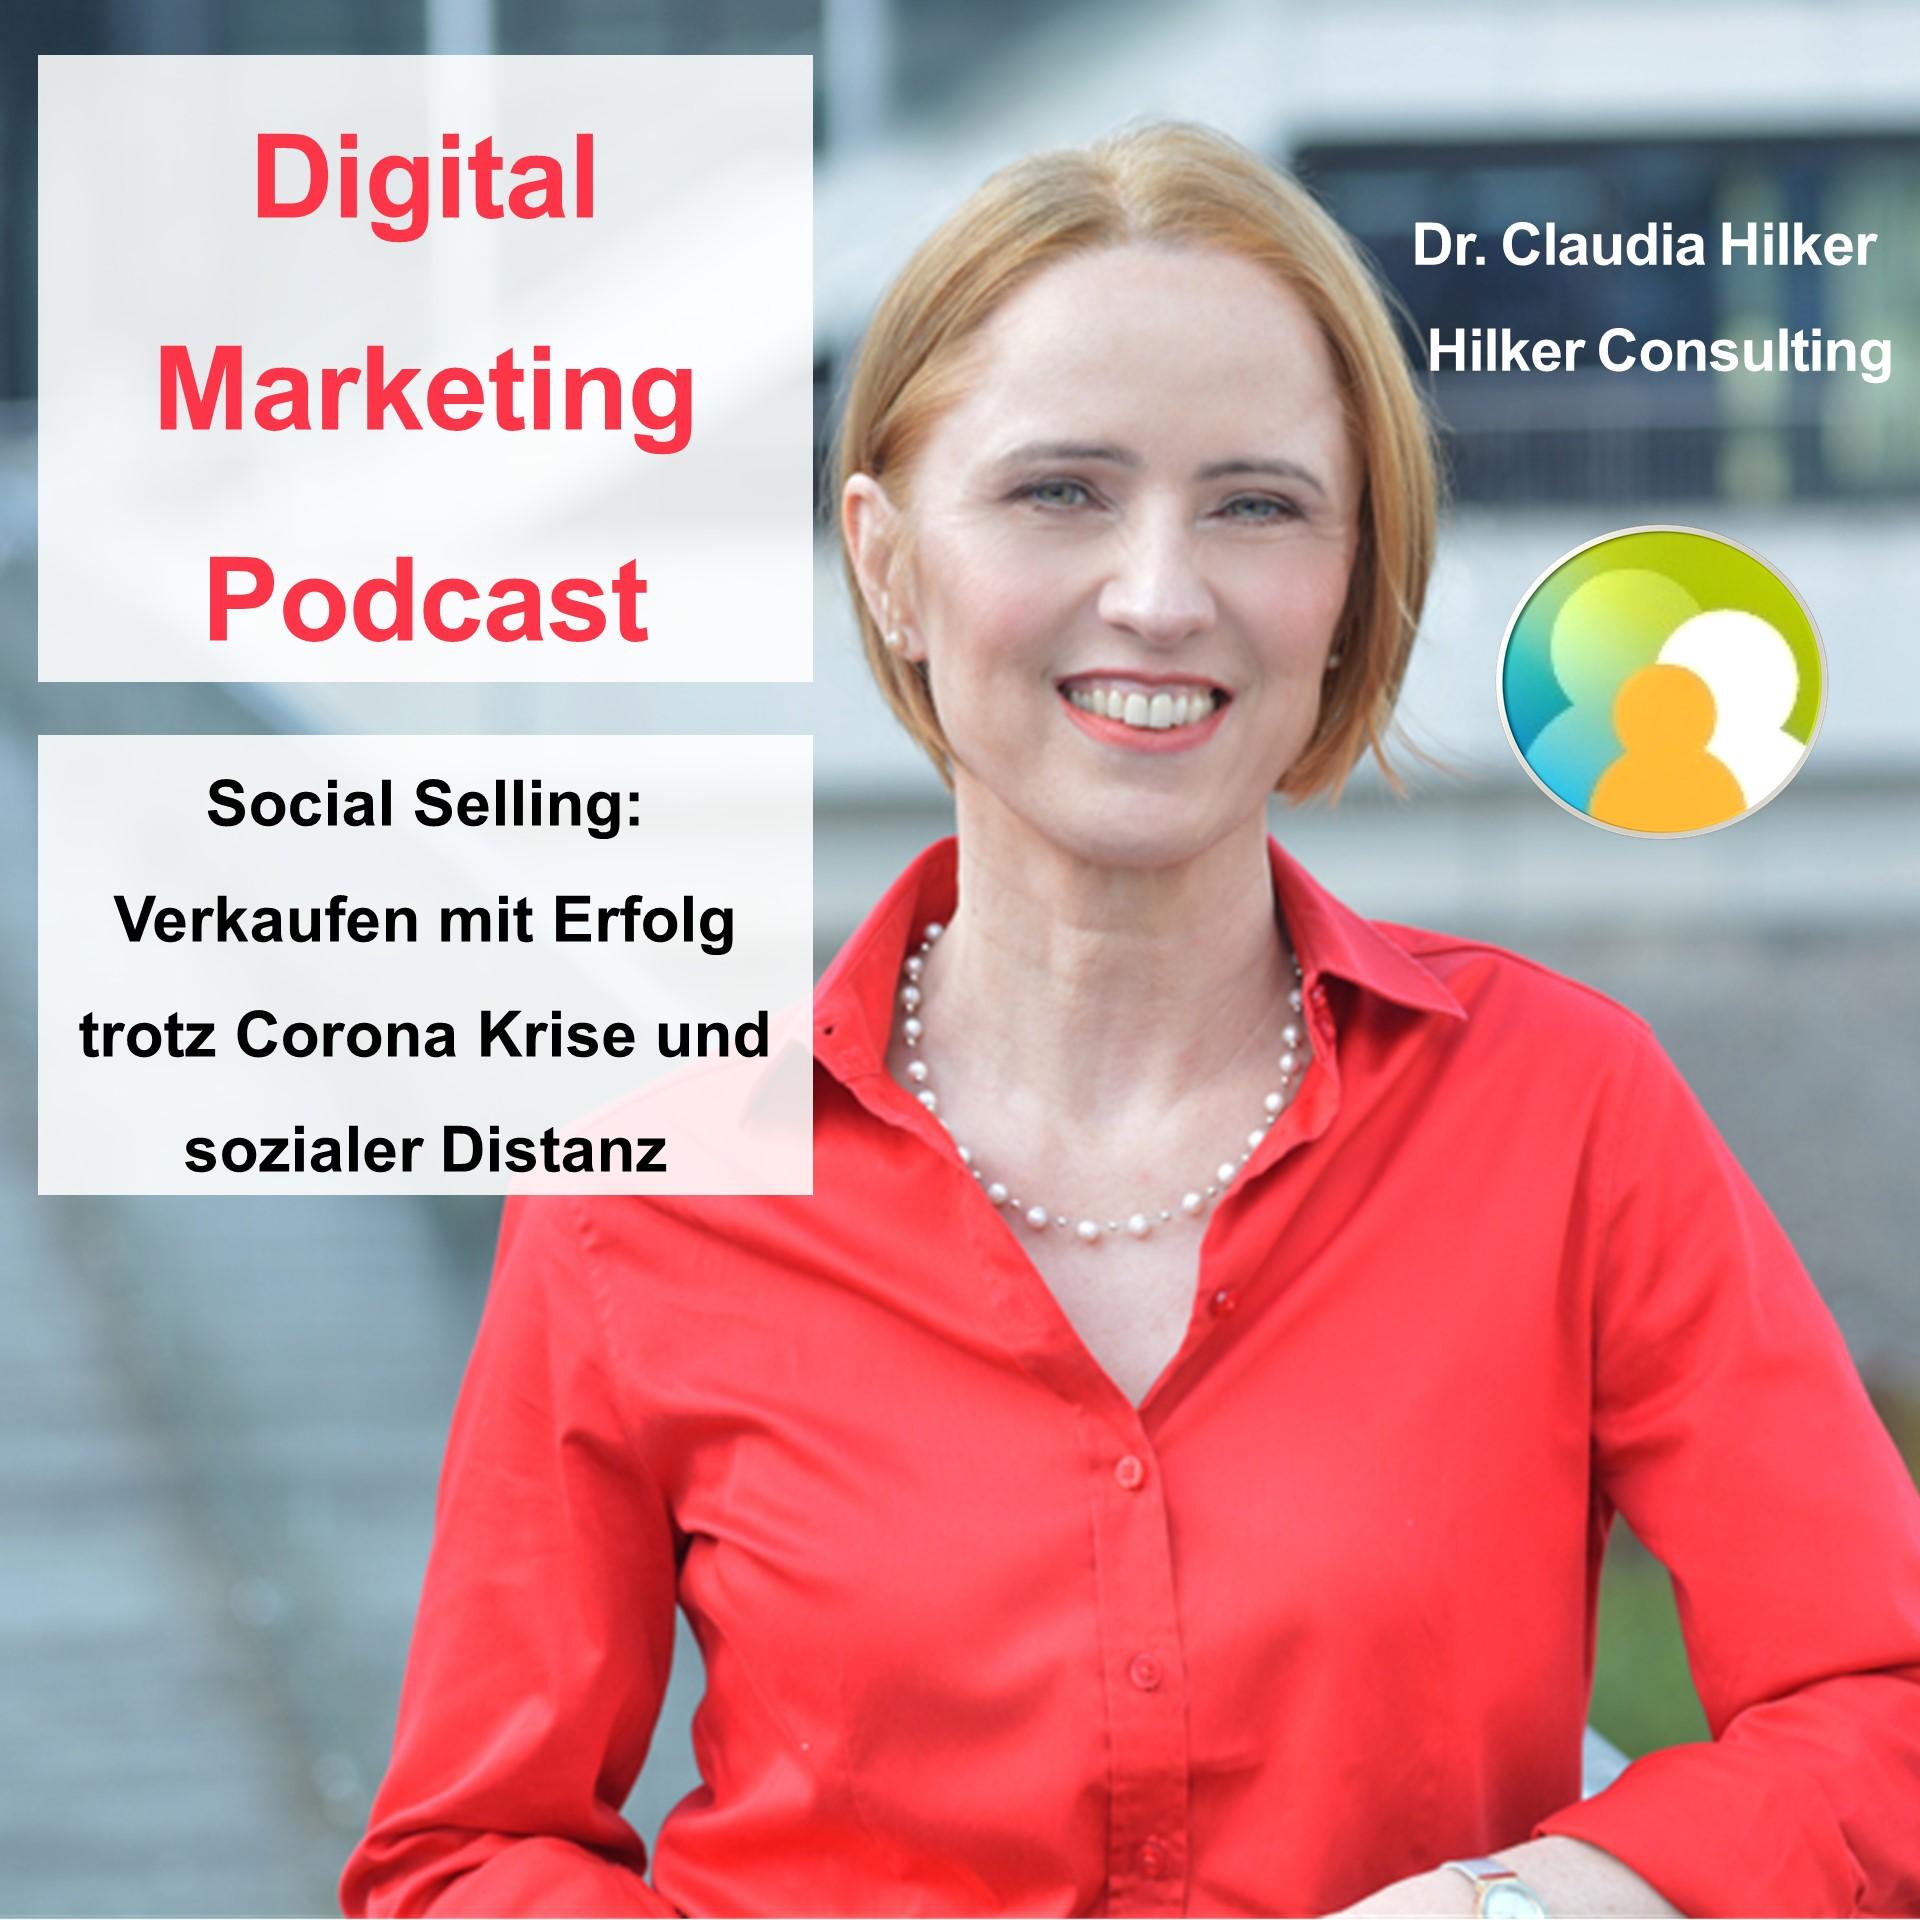 Digital Marketing Podcast_Verkaufen mit Erfolg trotz Corona Krise mit Social Selling